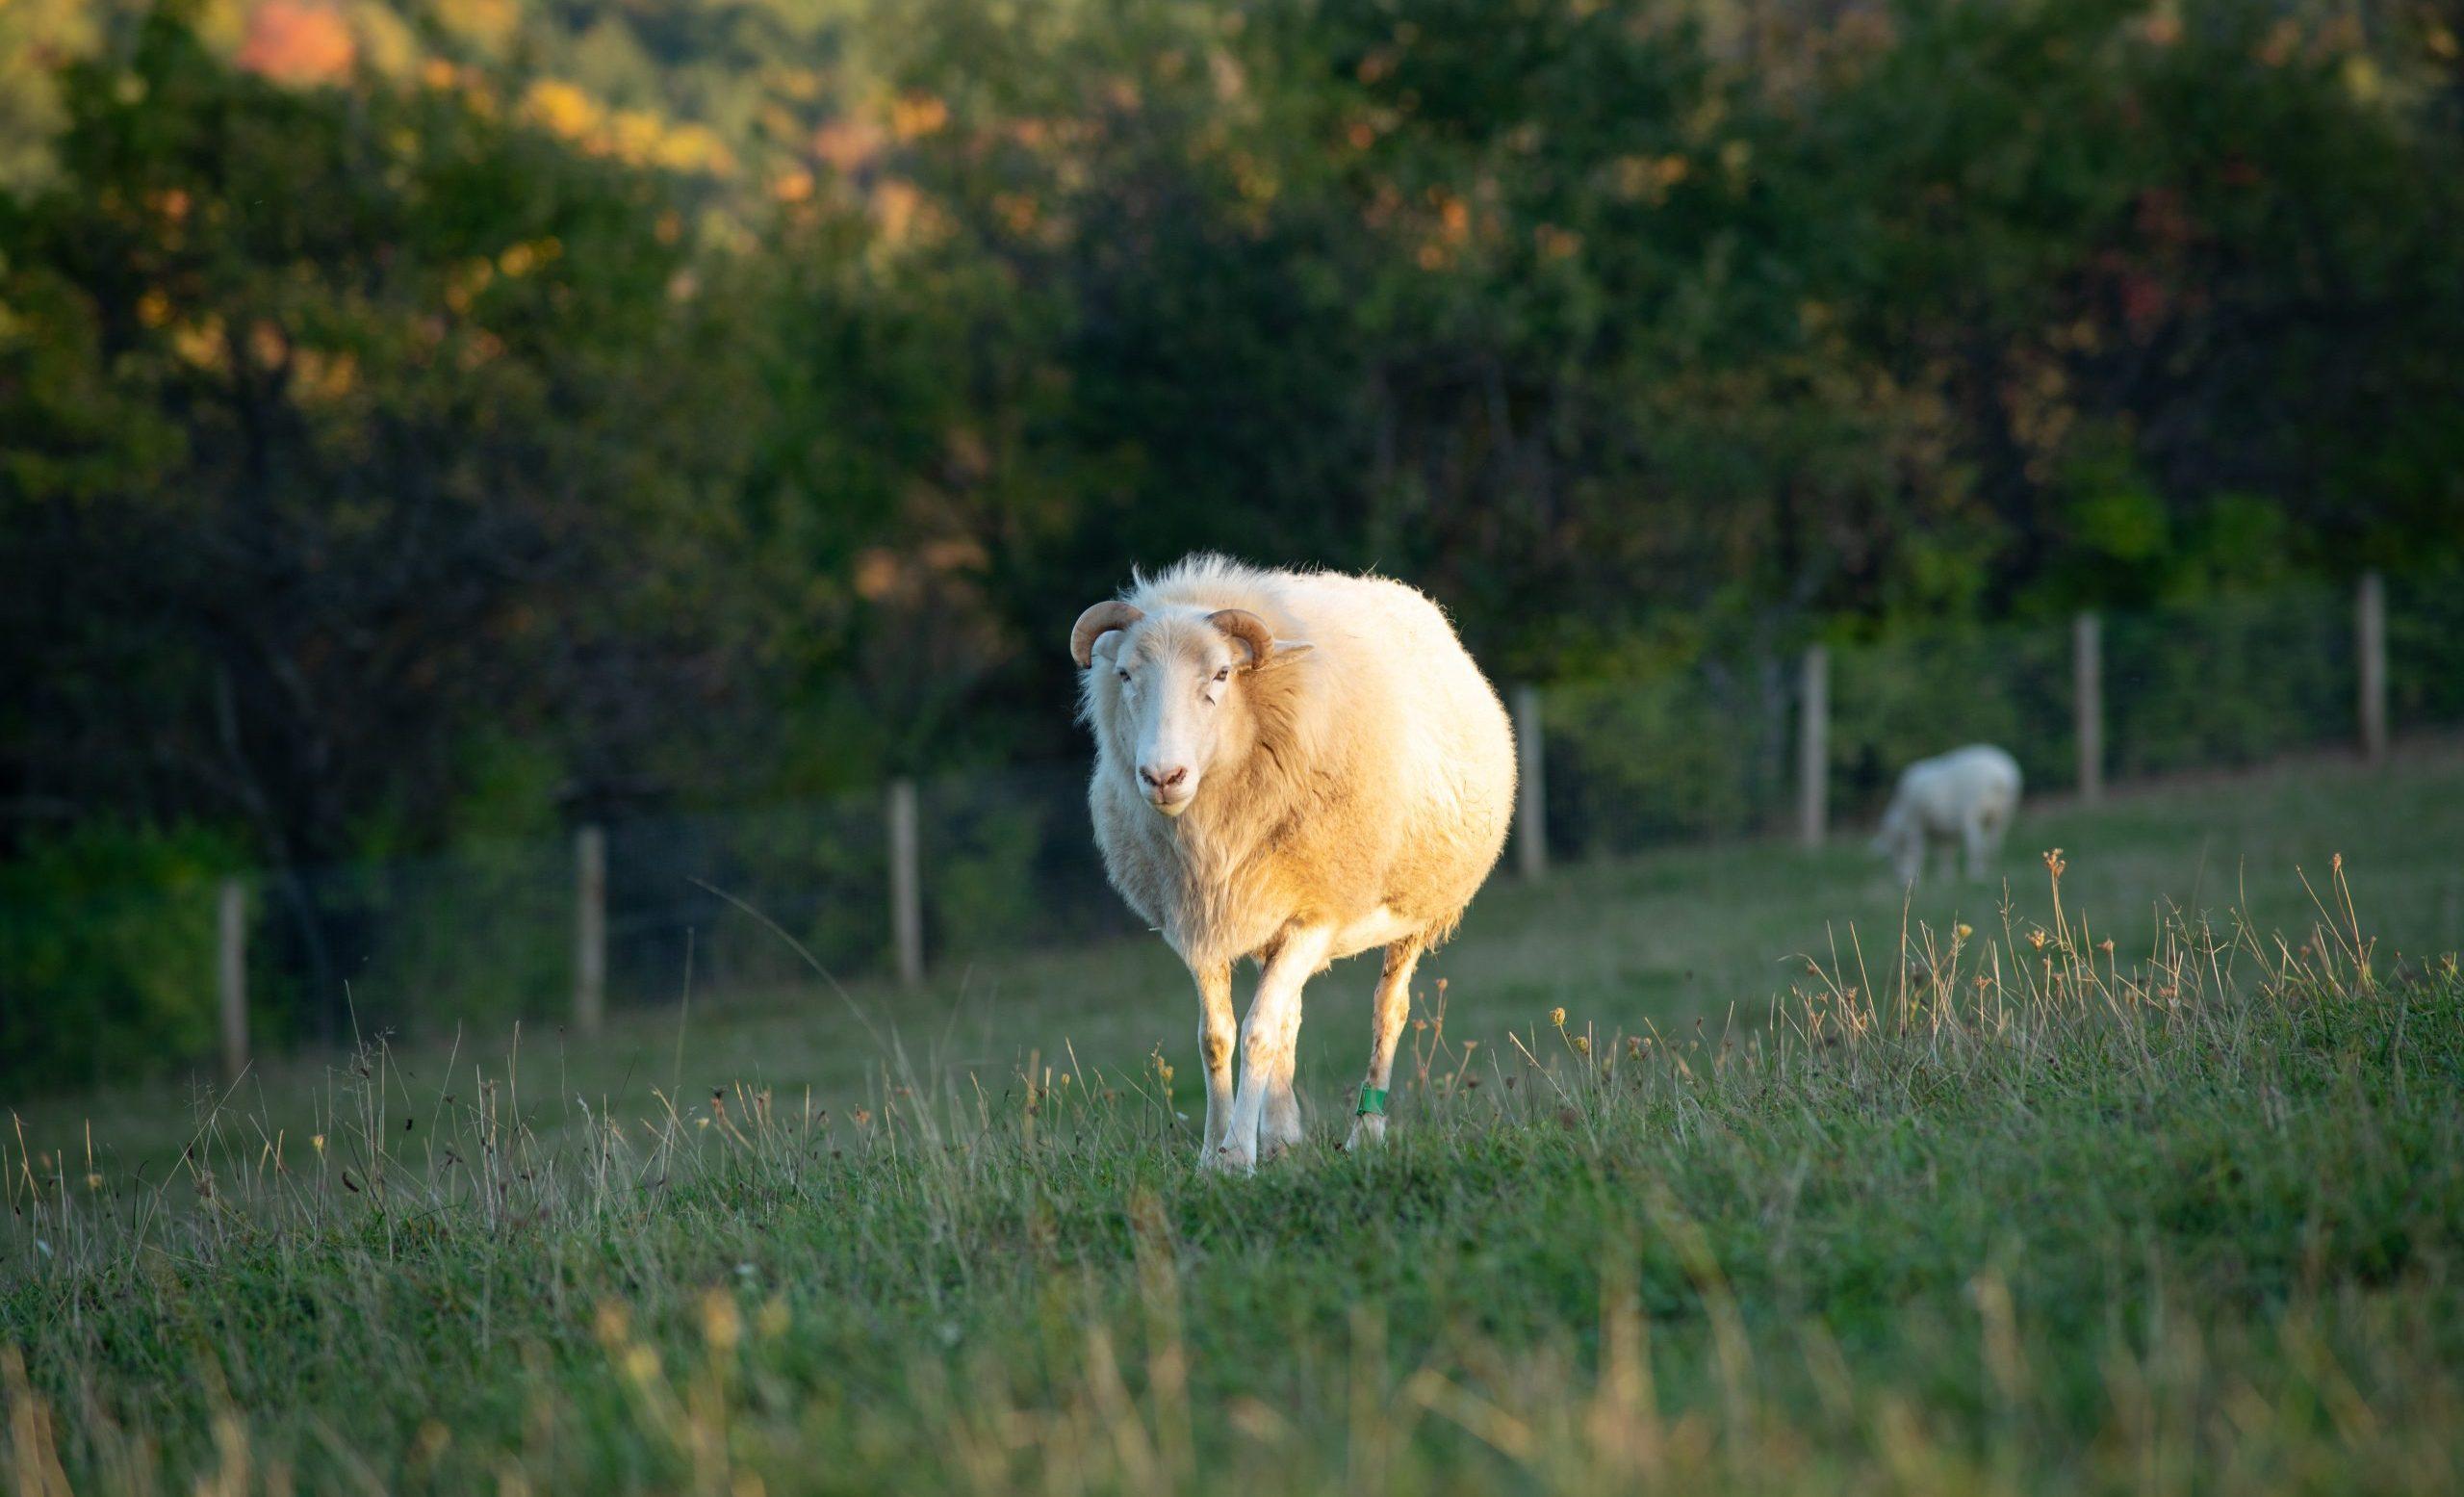 Ash Sheep at Farm Sanctuary's New York shelter